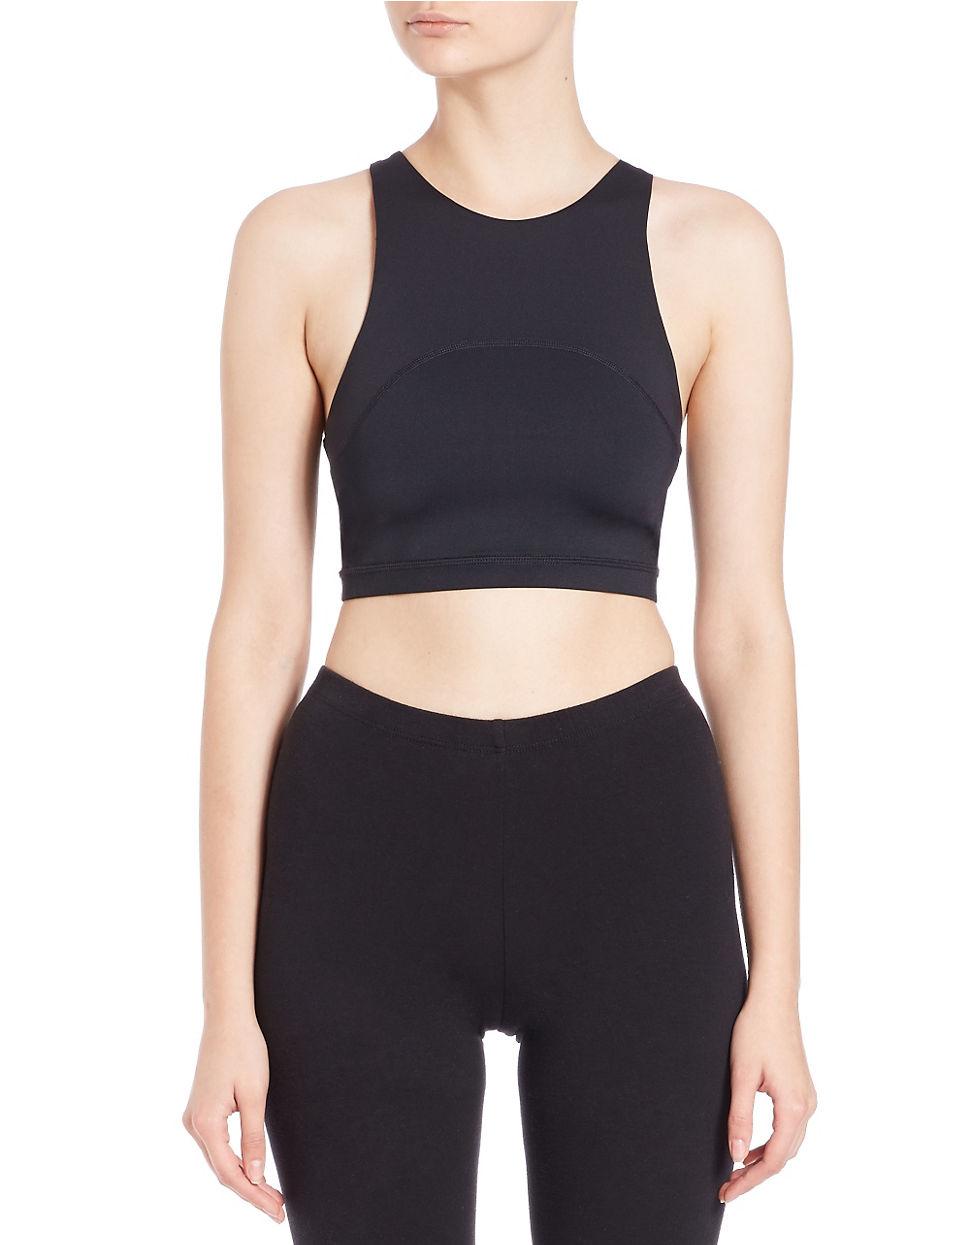 Kensie racerback sports bra in black lyst for Racerback t shirt bra